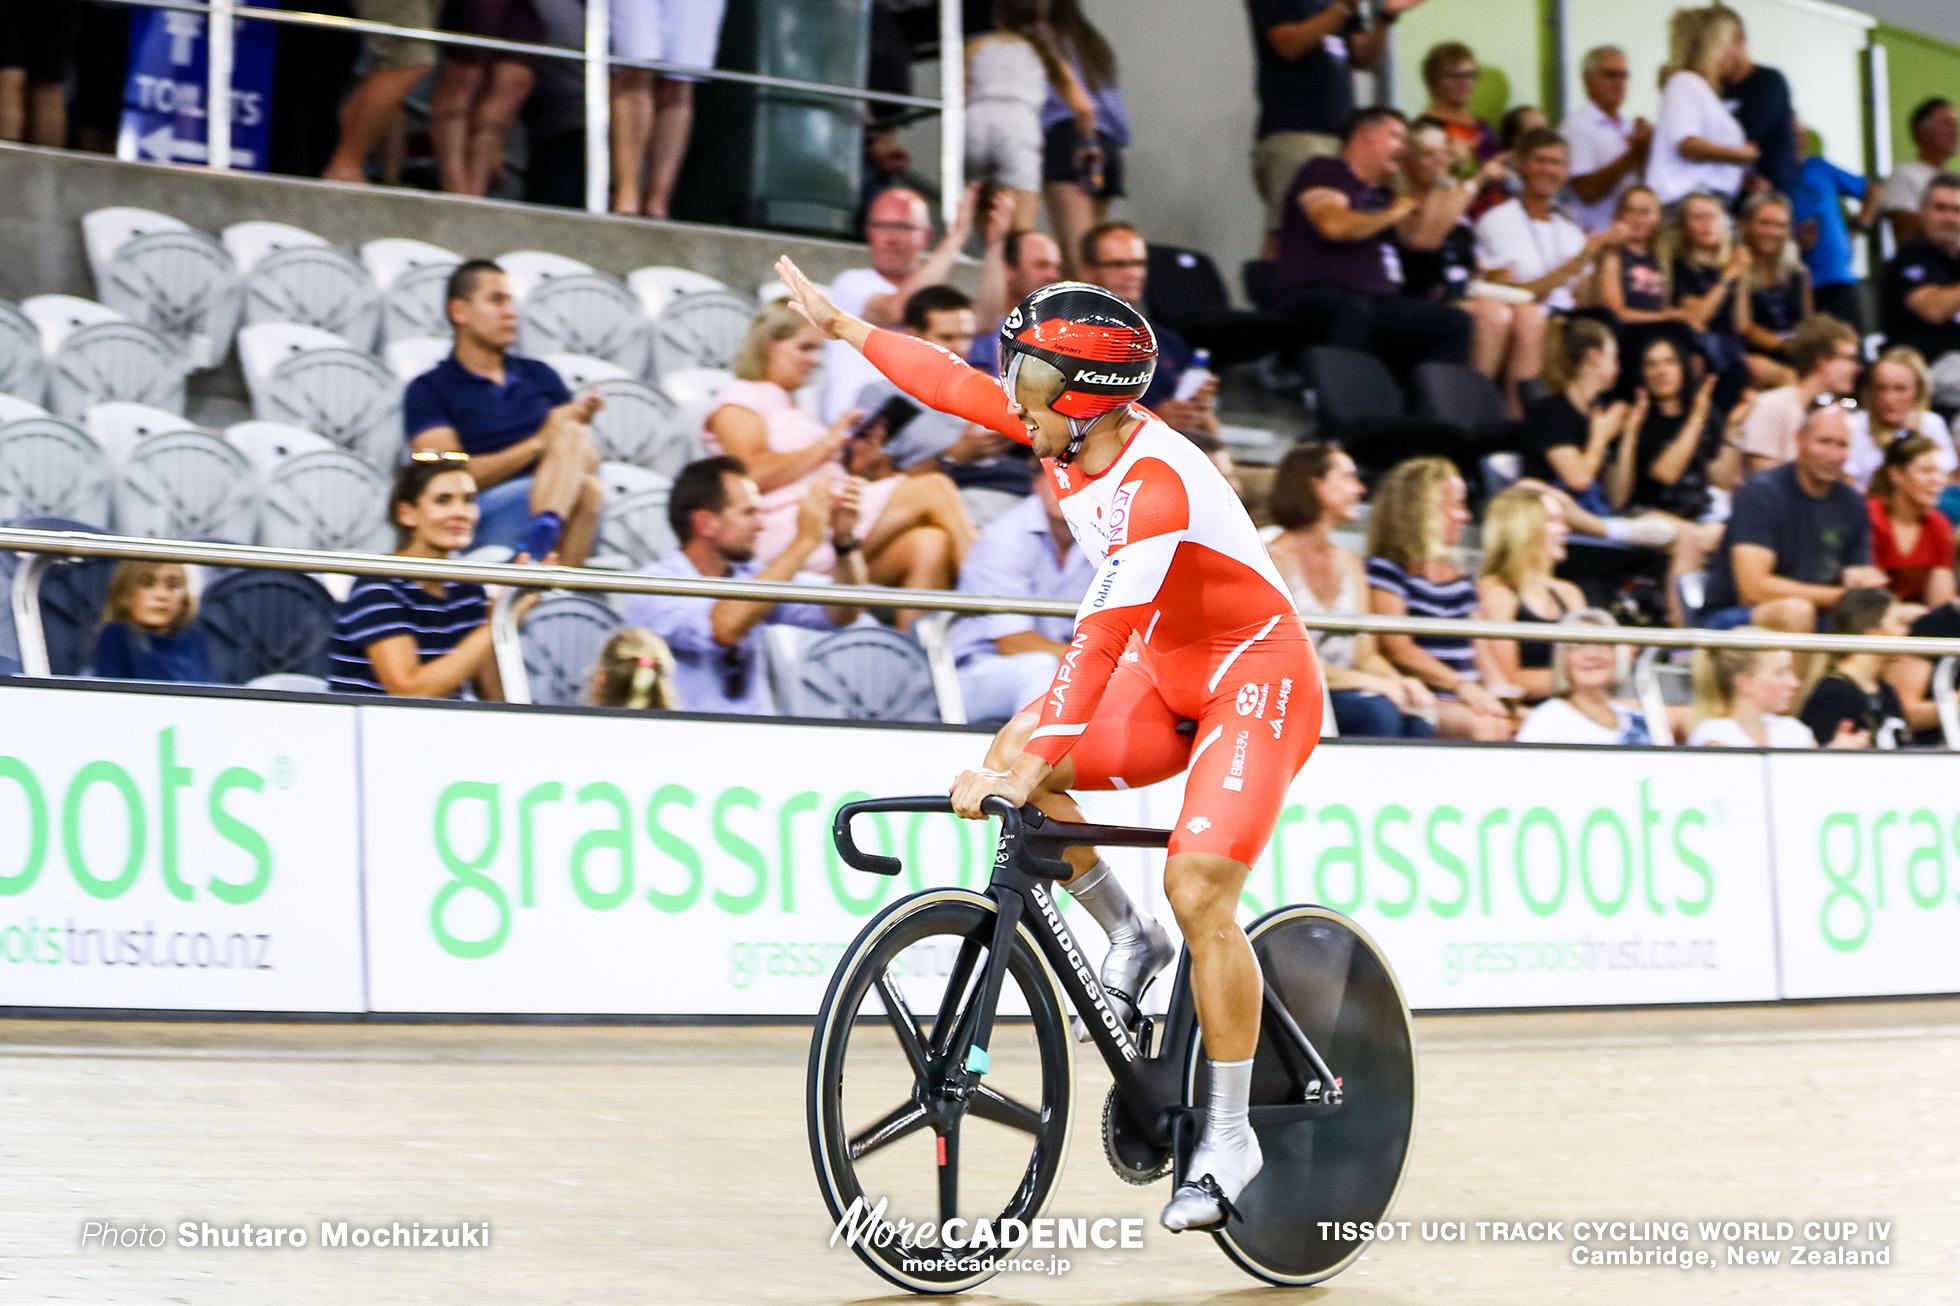 Final / Men's Team Sprint / TISSOT UCI TRACK CYCLING WORLD CUP IV, Cambridge, New Zealand, 雨谷一樹